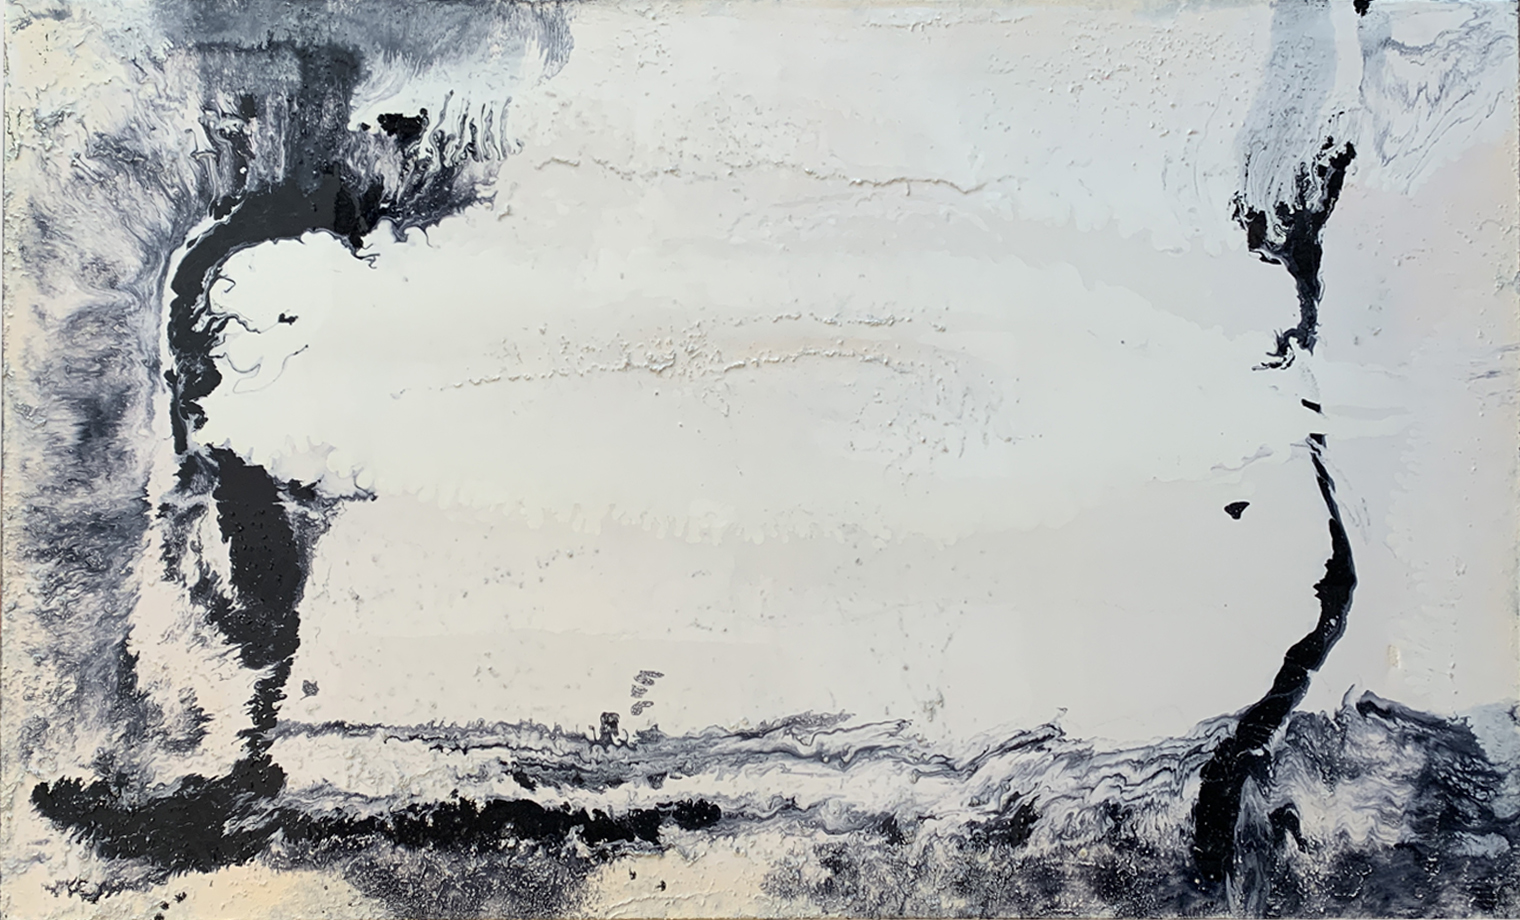 Edward Lentsch